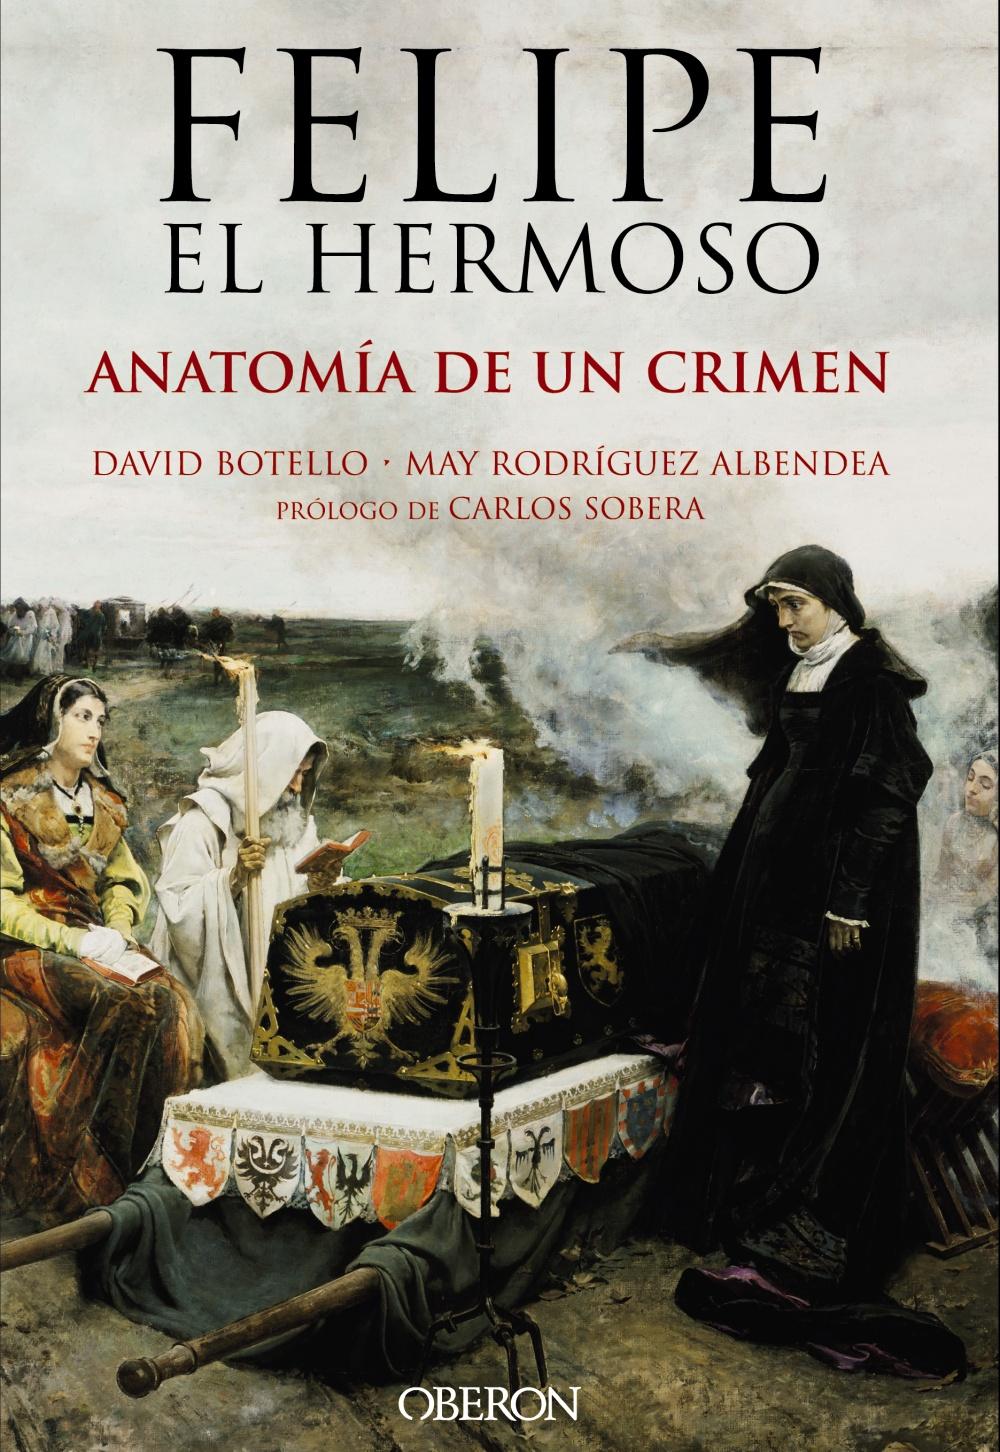 FELIPE EL HERMOSO: ANATOMIA DE UN CRIMEN | DAVID BOTELLO MENDEZ ...